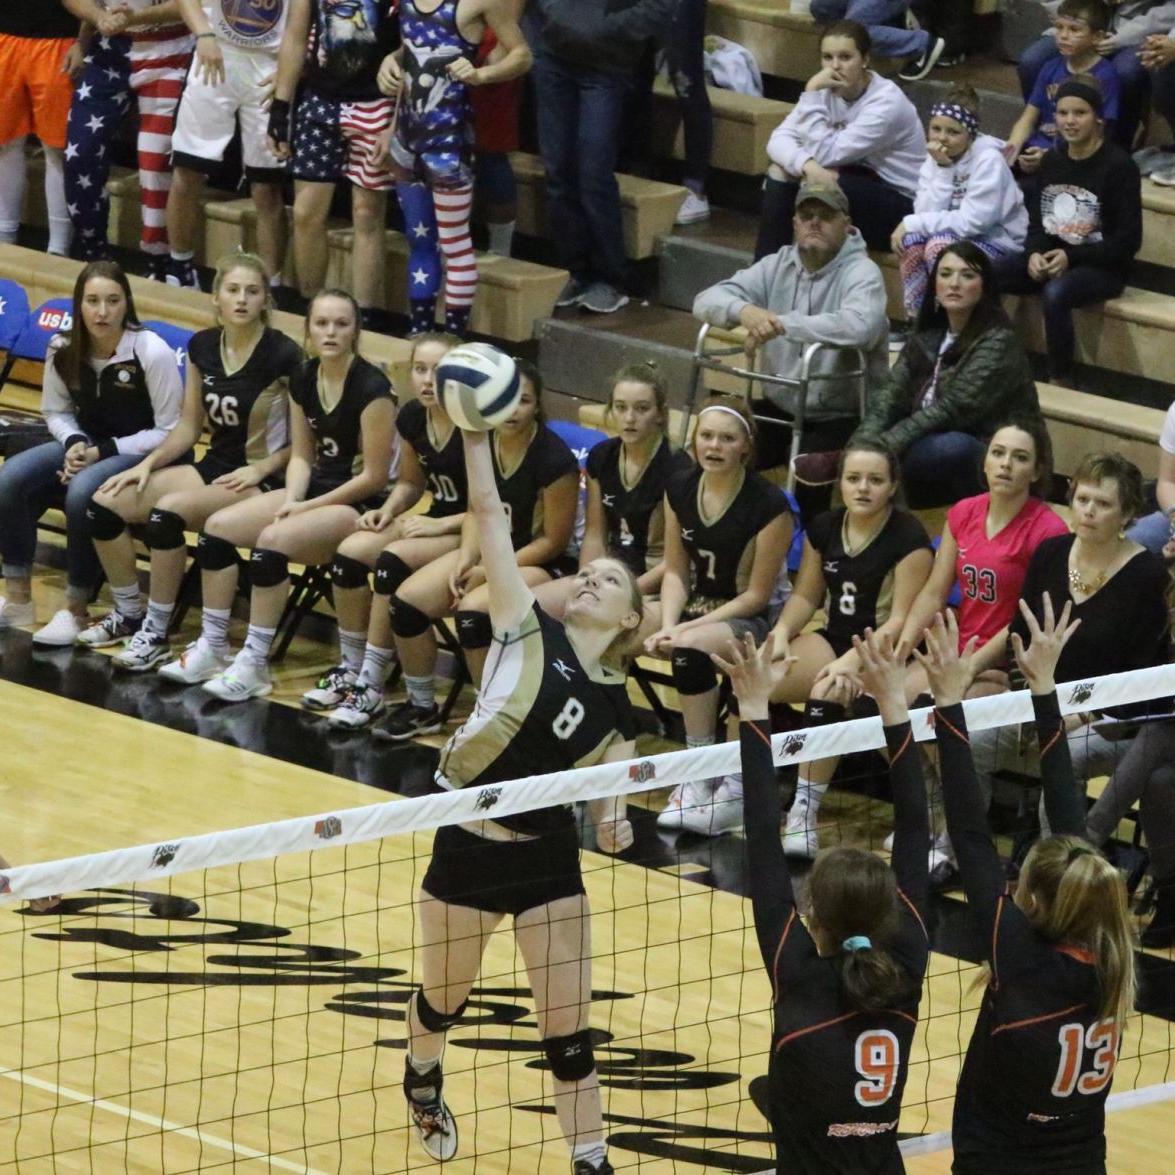 2018 Nebraska State Volleyball Tournament photo gallery